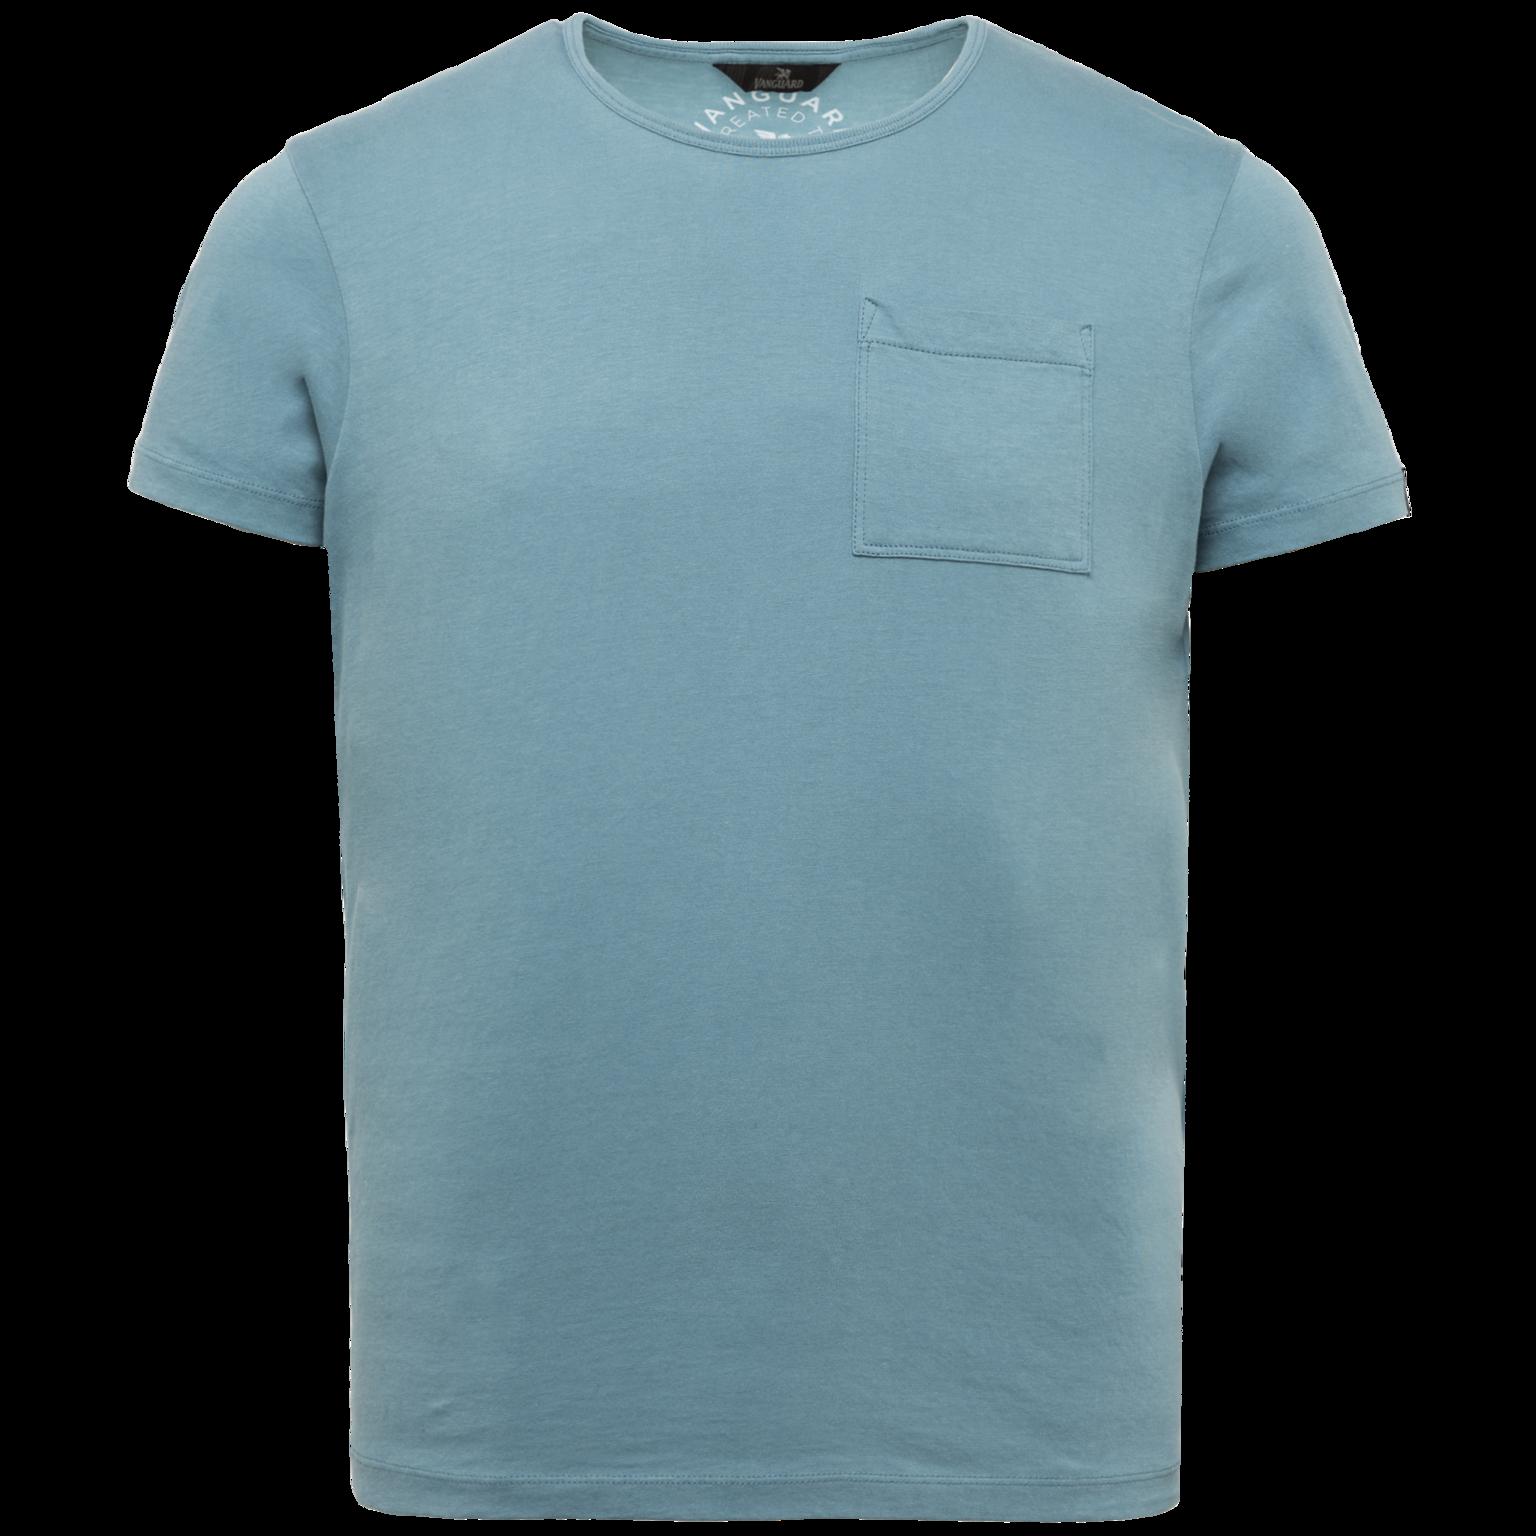 VANGUARD t-shirt jersey bamboo-1